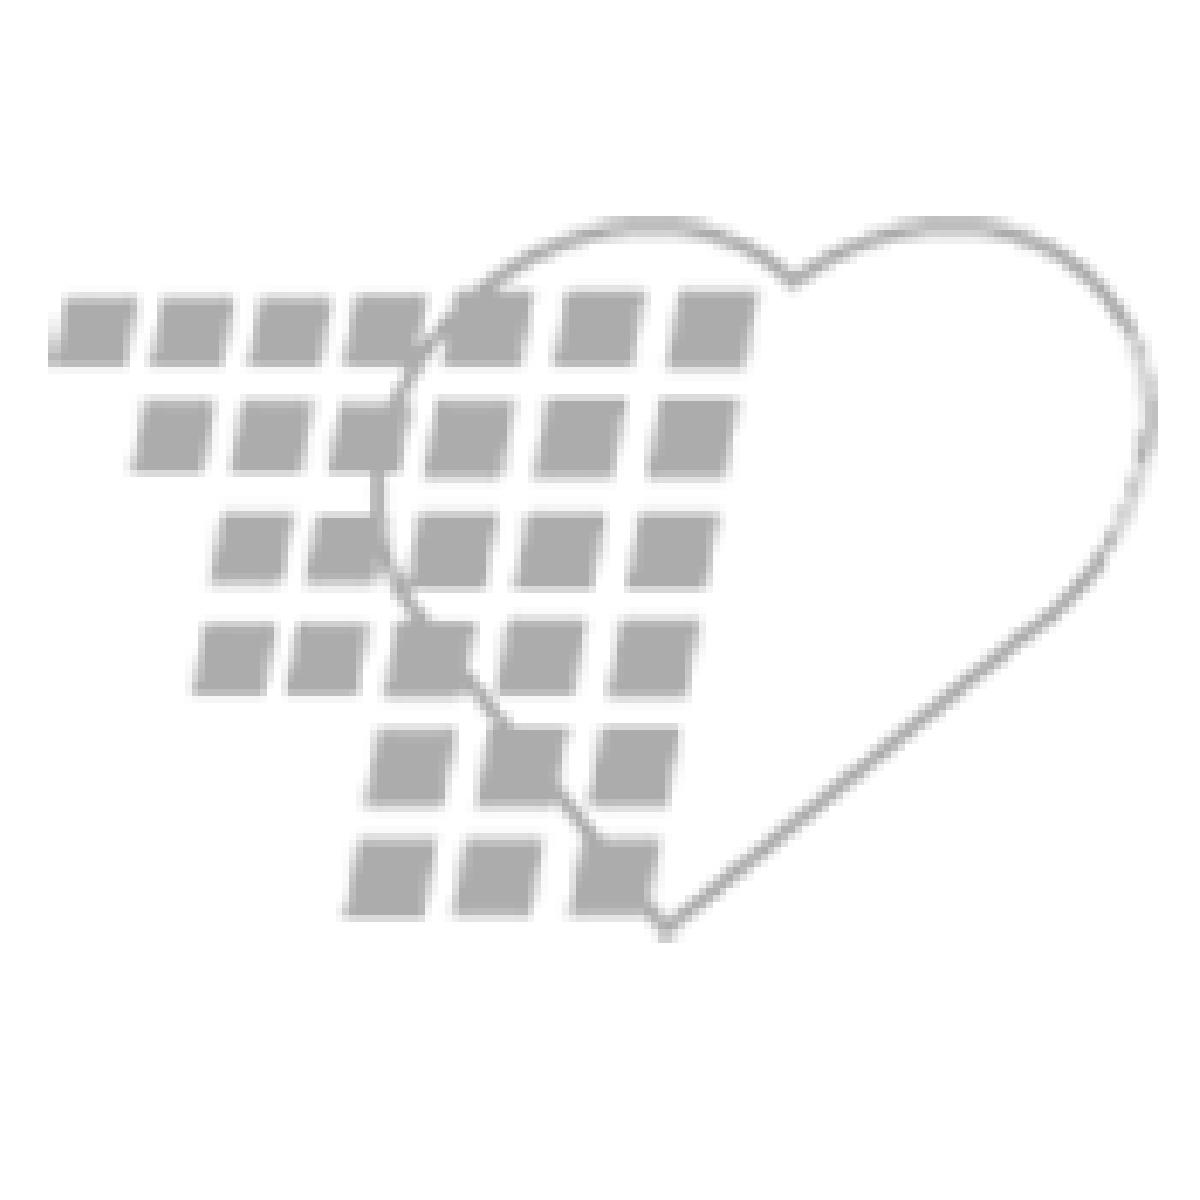 06-26-3050P PROTECTIV® Safety I.V. Catheters